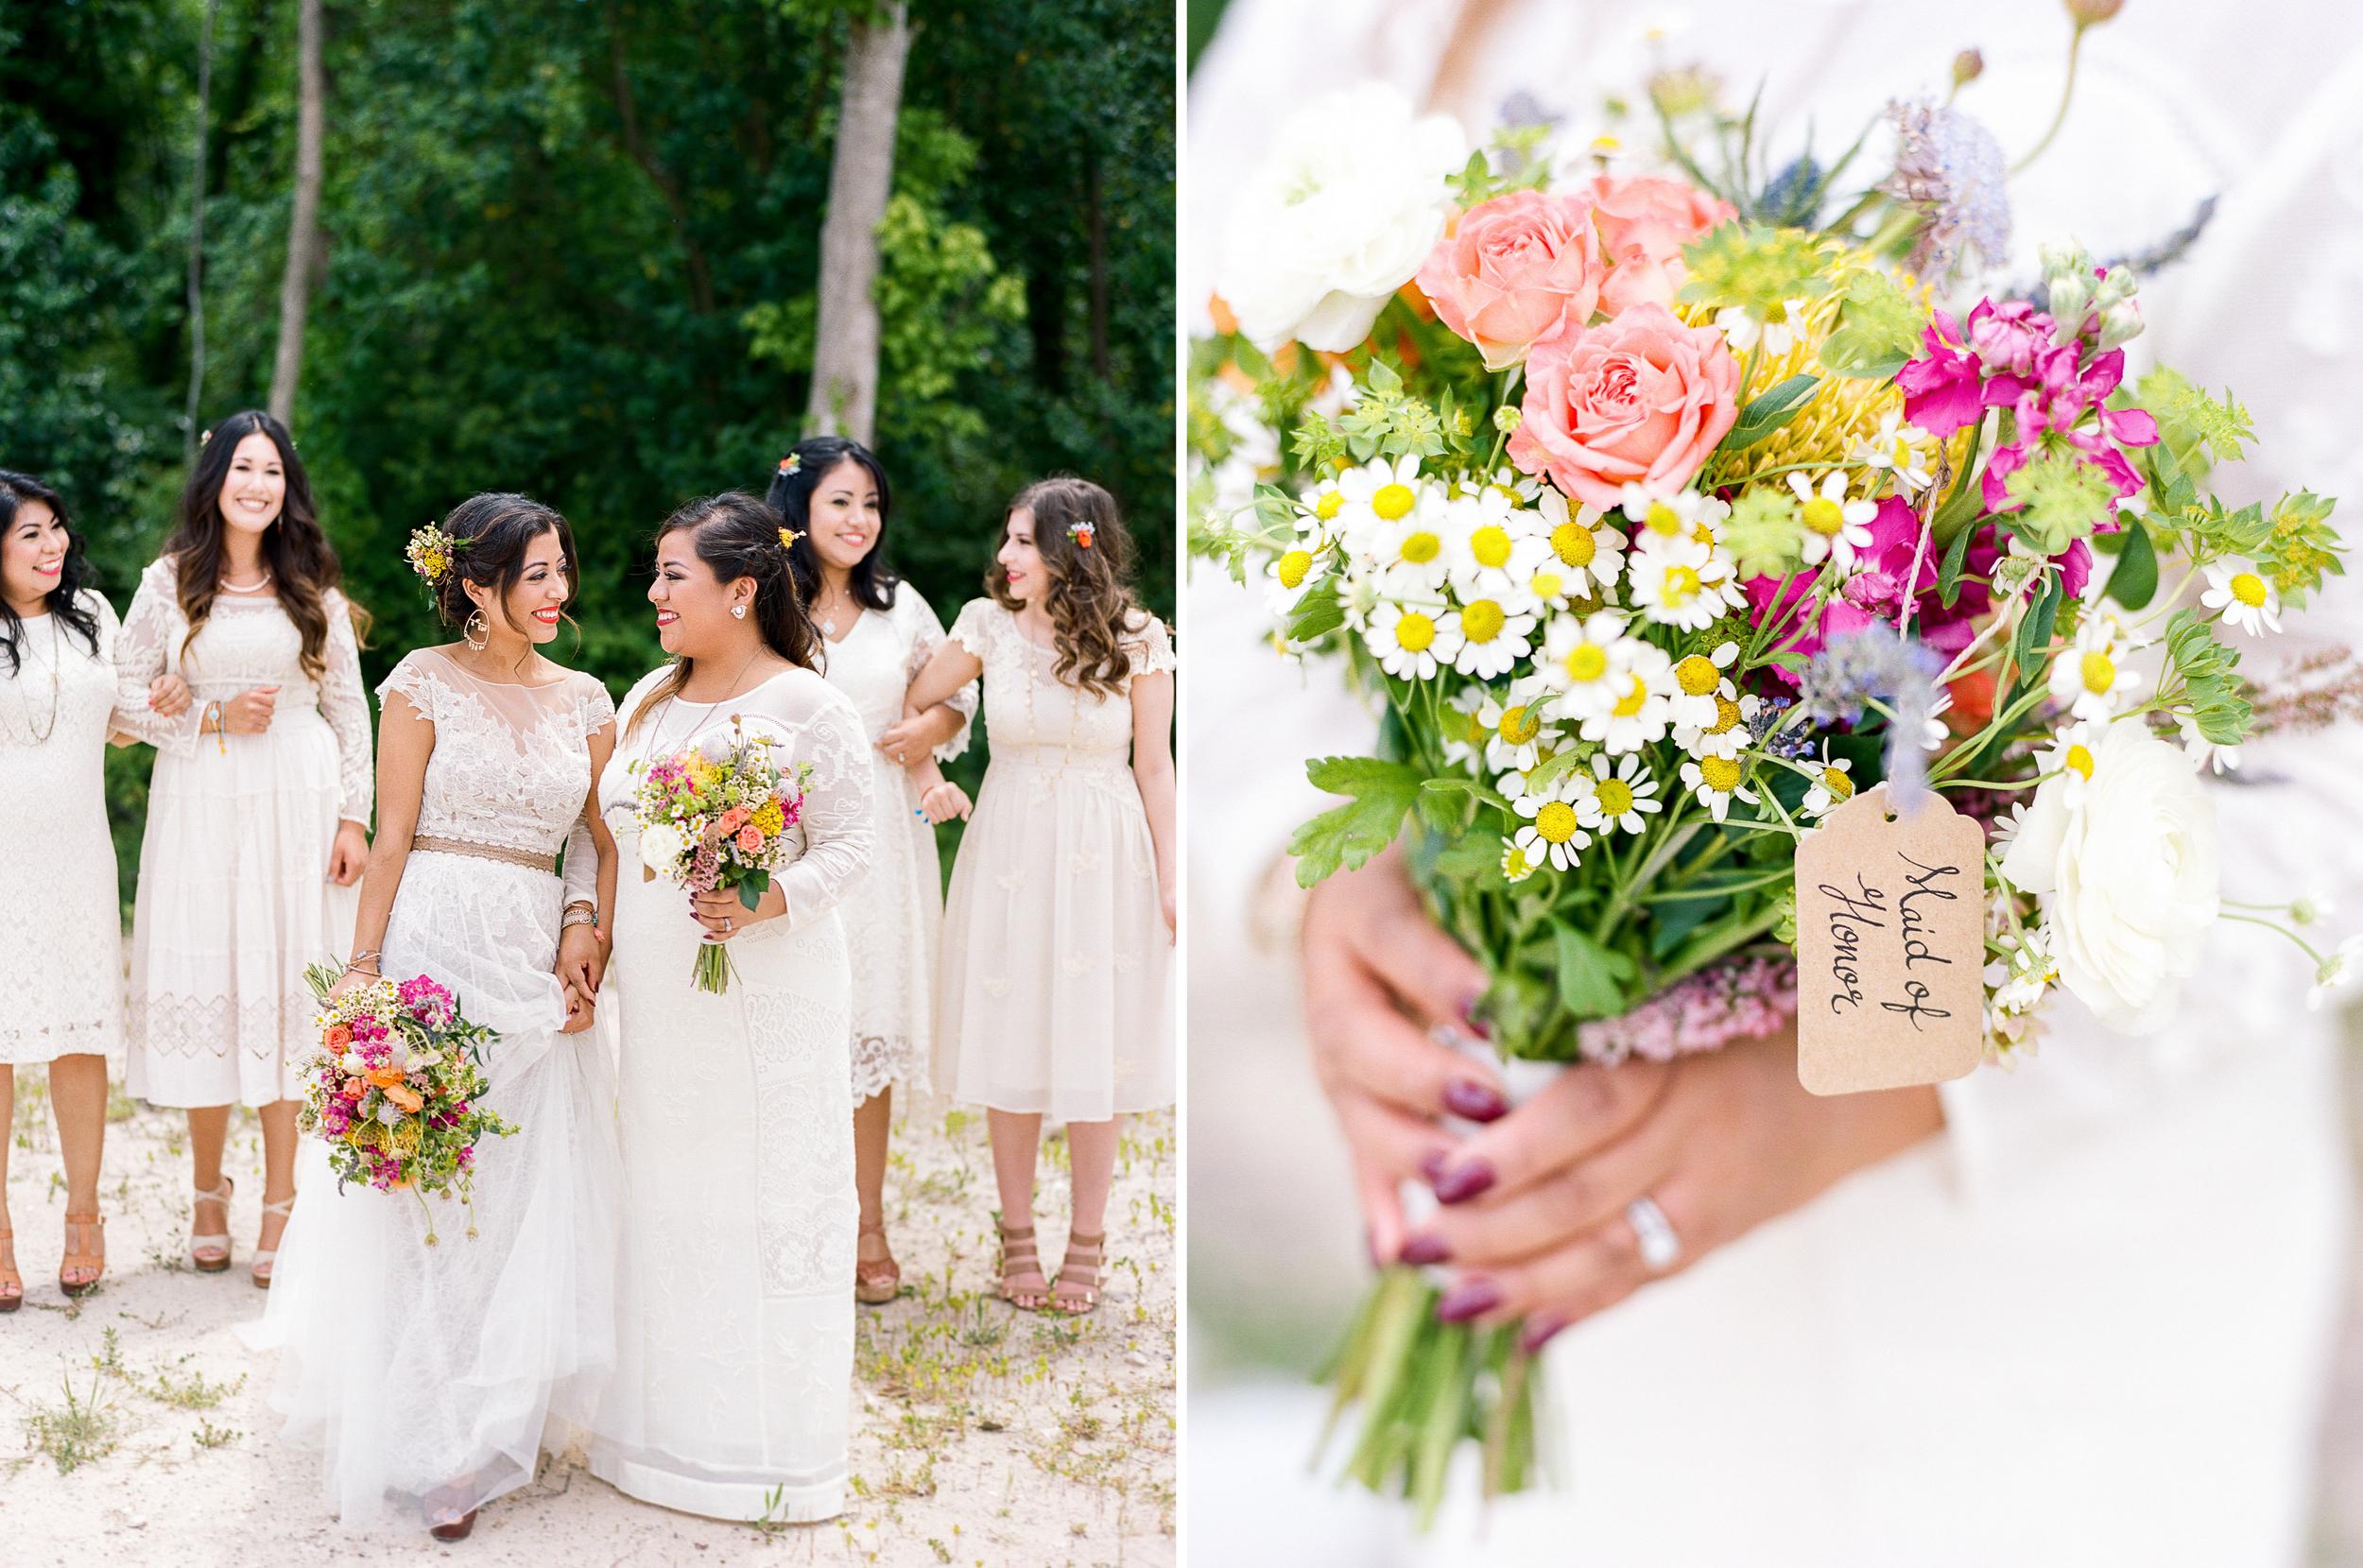 Dana-Fernandez-Photography-Martha-Stewart-Weddings-Houston-Texas-Wedding-Photographer-Film-105.jpg